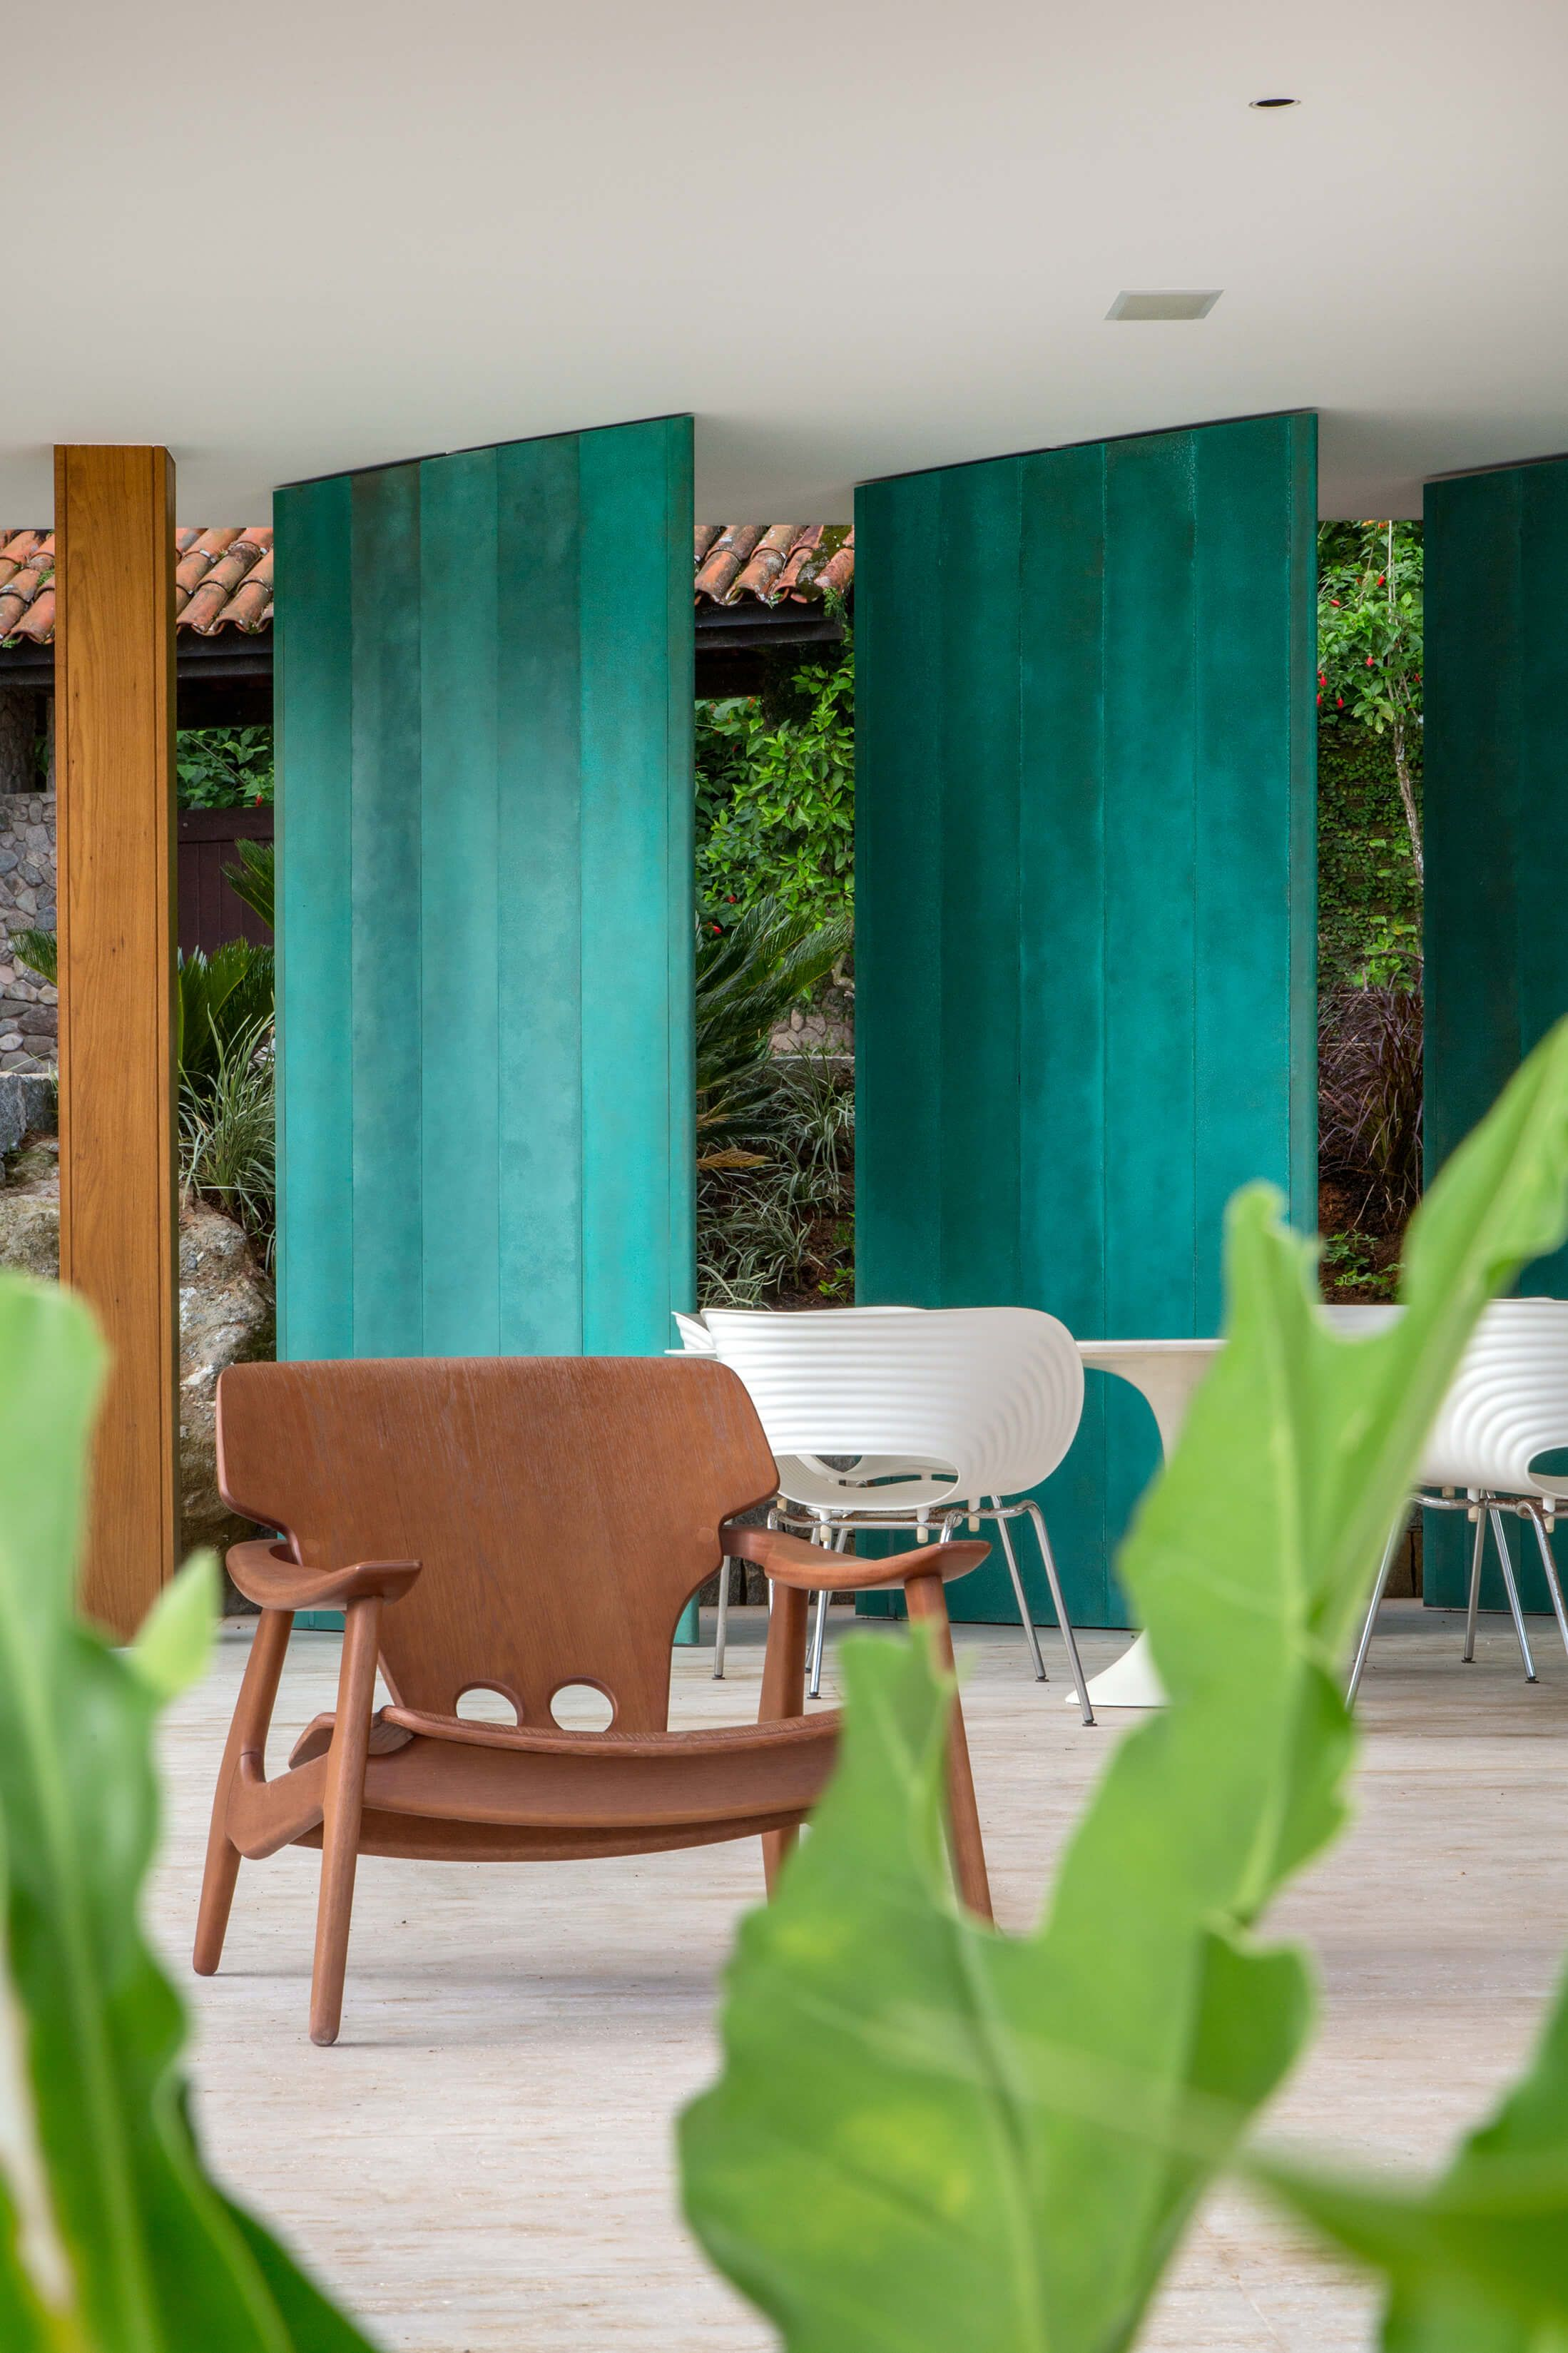 160318 Erich Mariani 08 Res190 Tiny Casas Pinterest # Muebles Luan Arbo